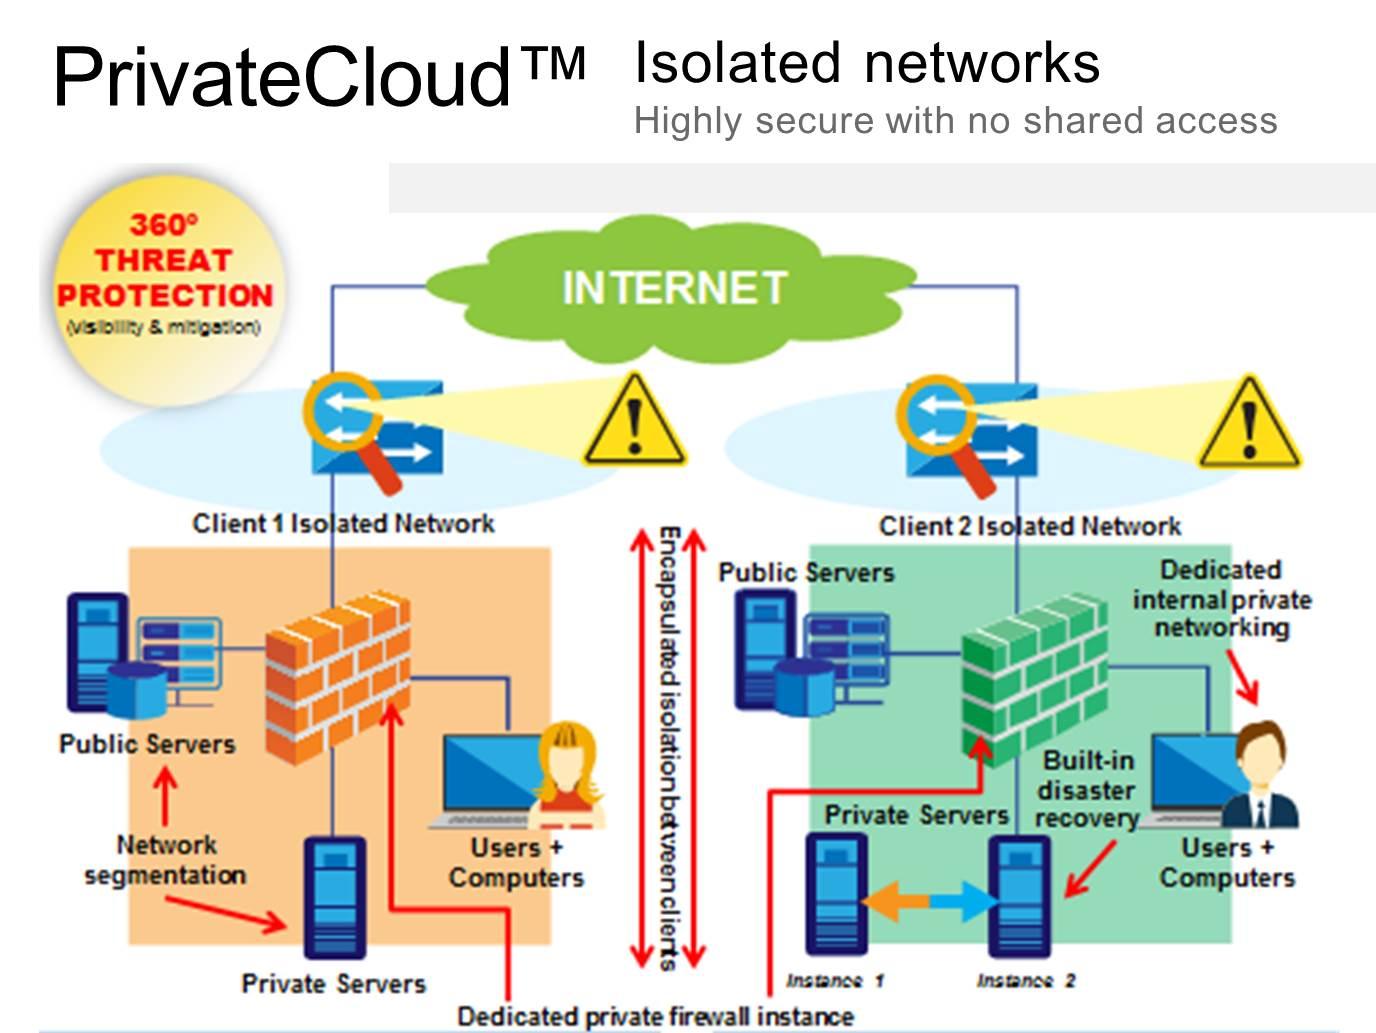 Each client has a dedicated firewall